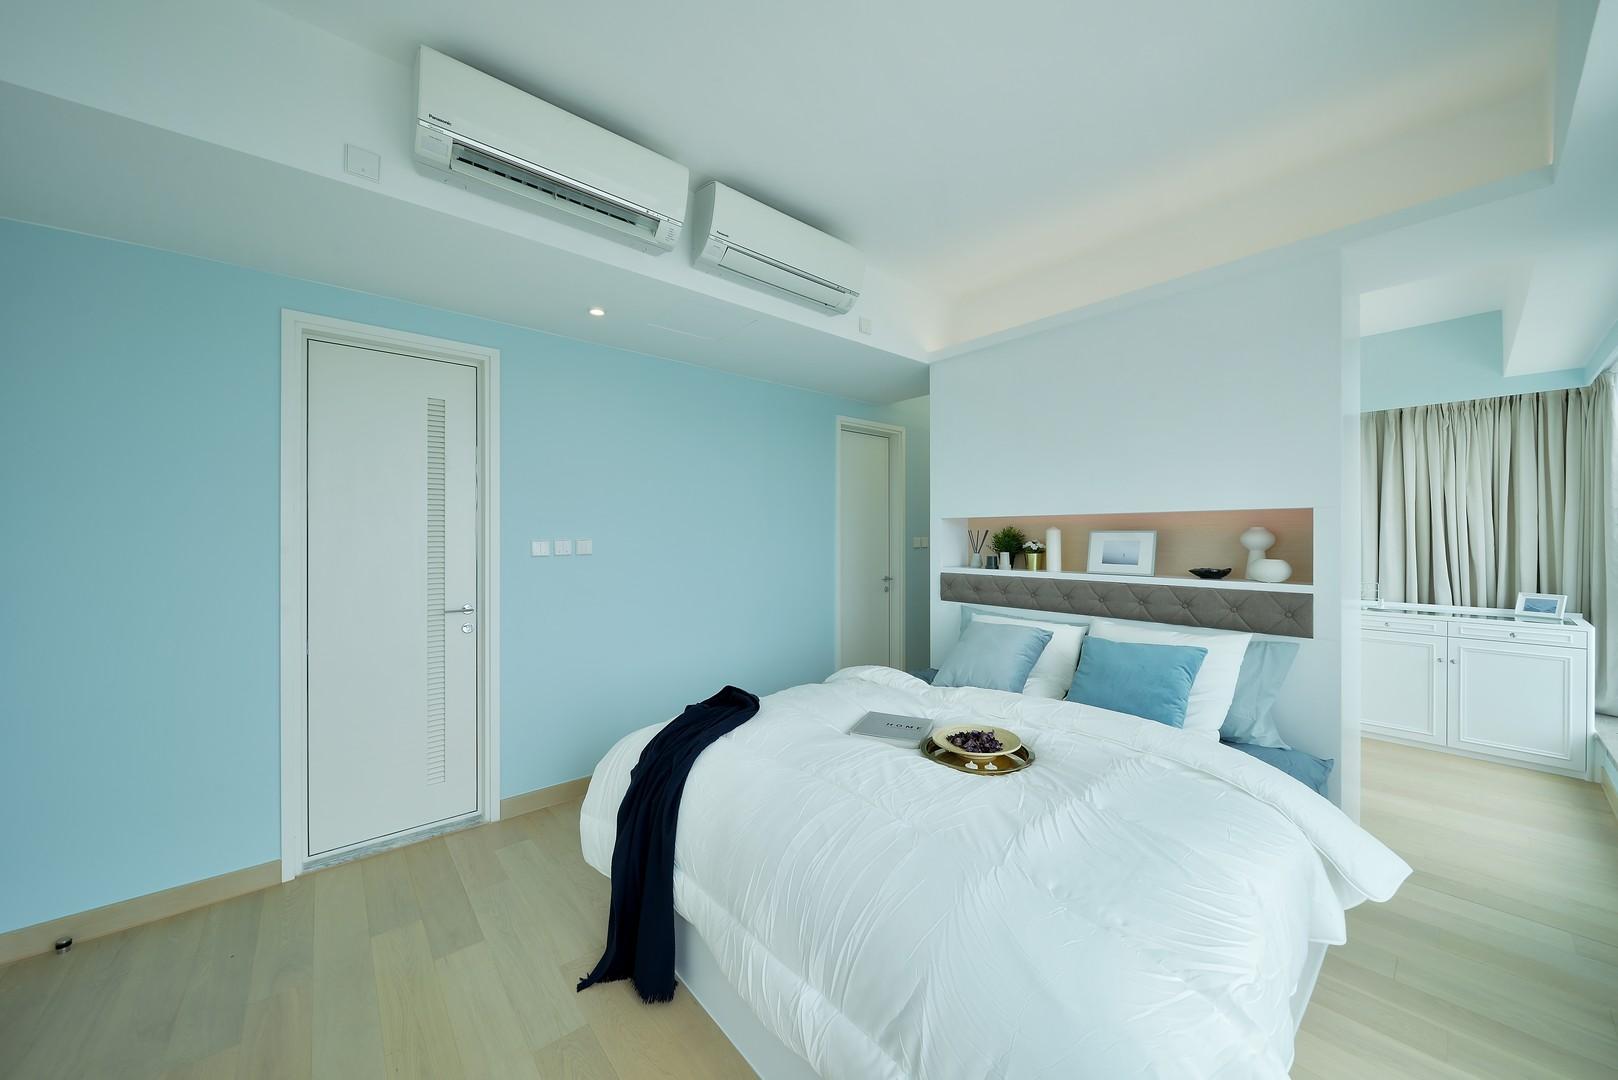 Inch Interior Design Hong Kong - The Capri 003